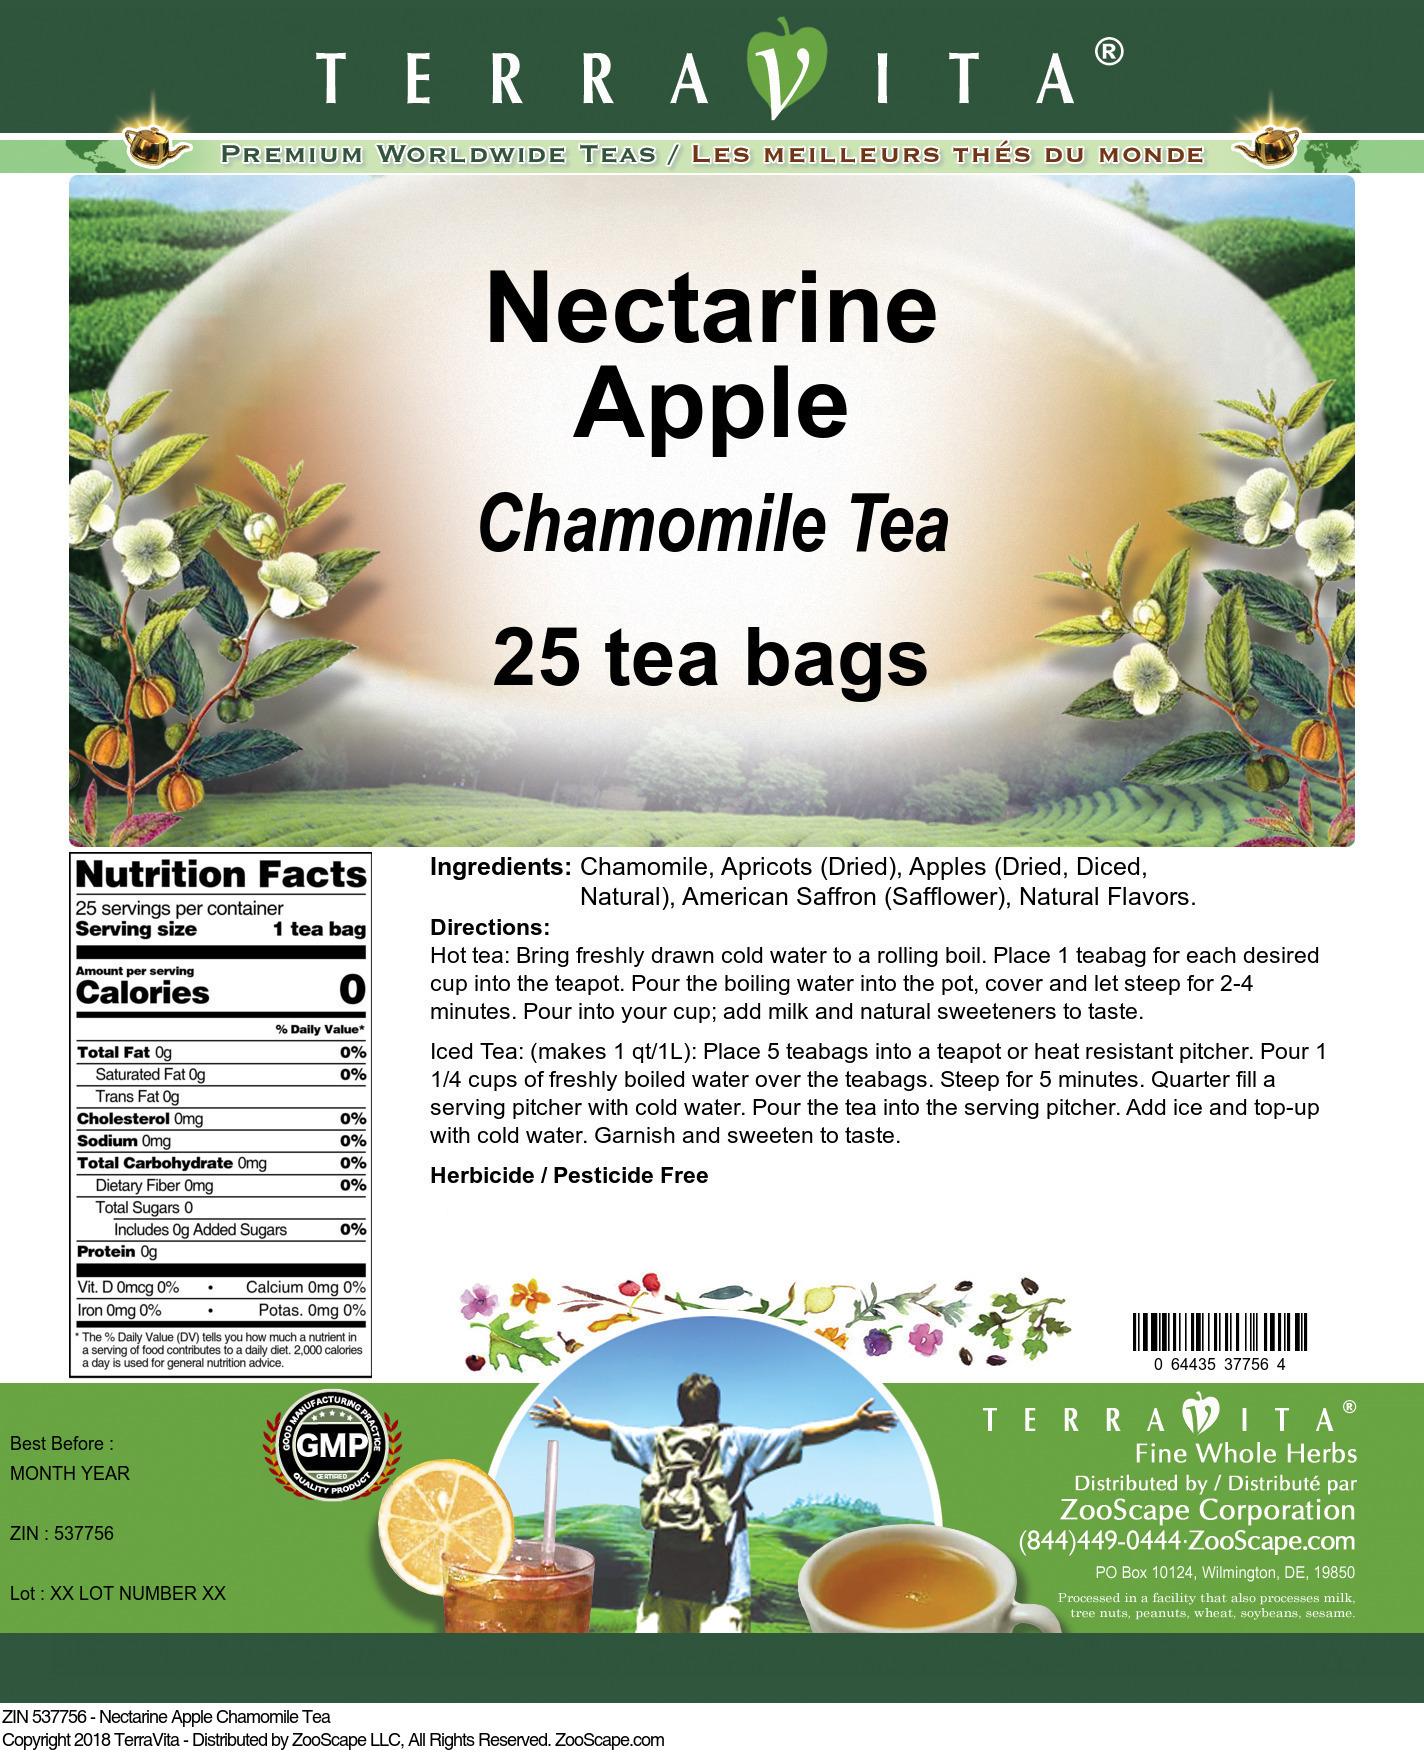 Nectarine Apple Chamomile Tea